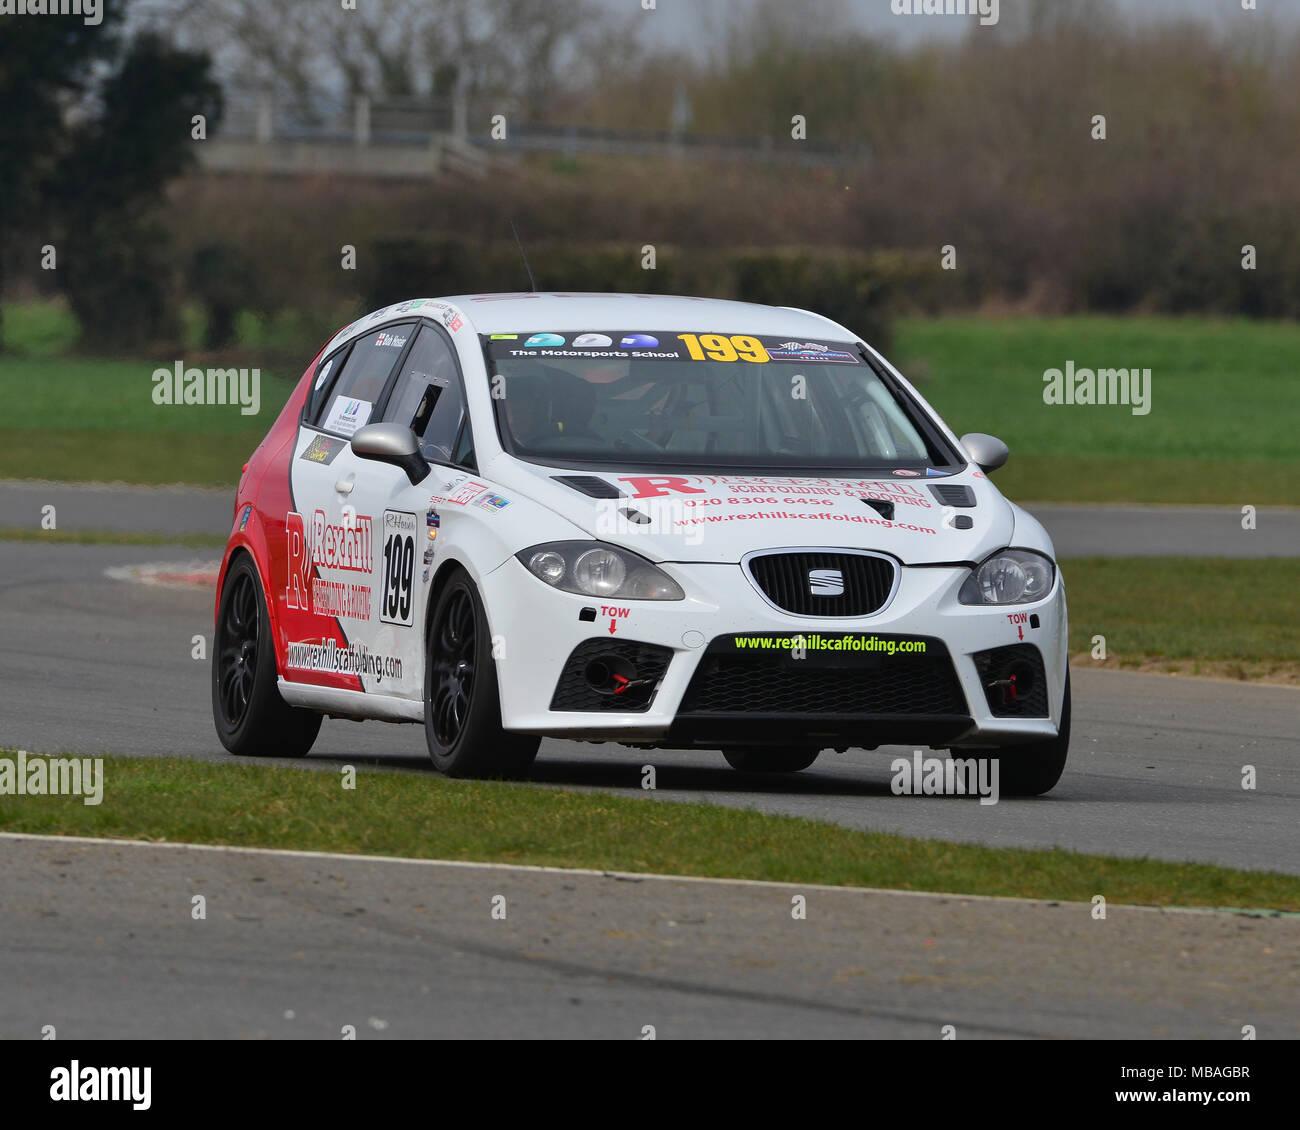 Snetterton Motor Racing Circuit, Snetterton, Norfolk